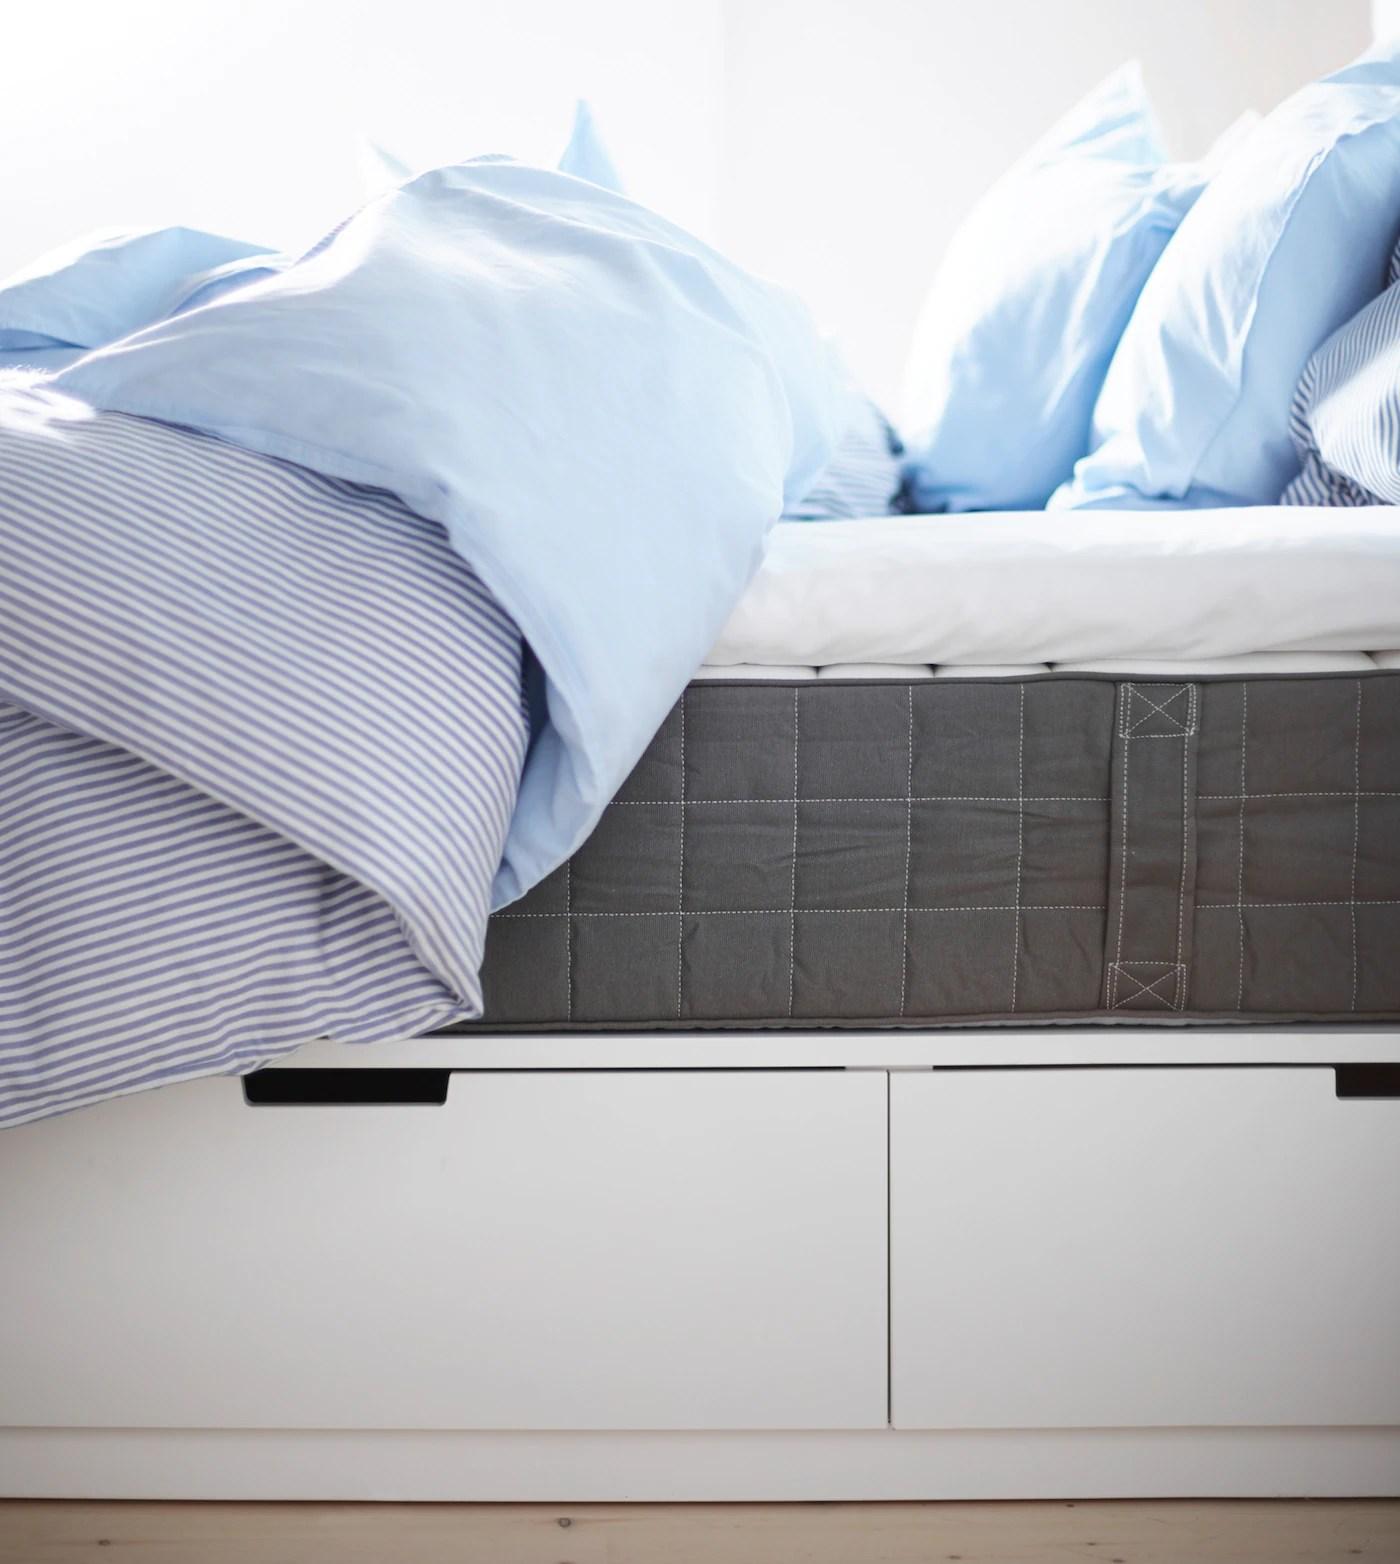 Wickeltischaufsatz Selber Bauen | Ikea Nordli Bett ...